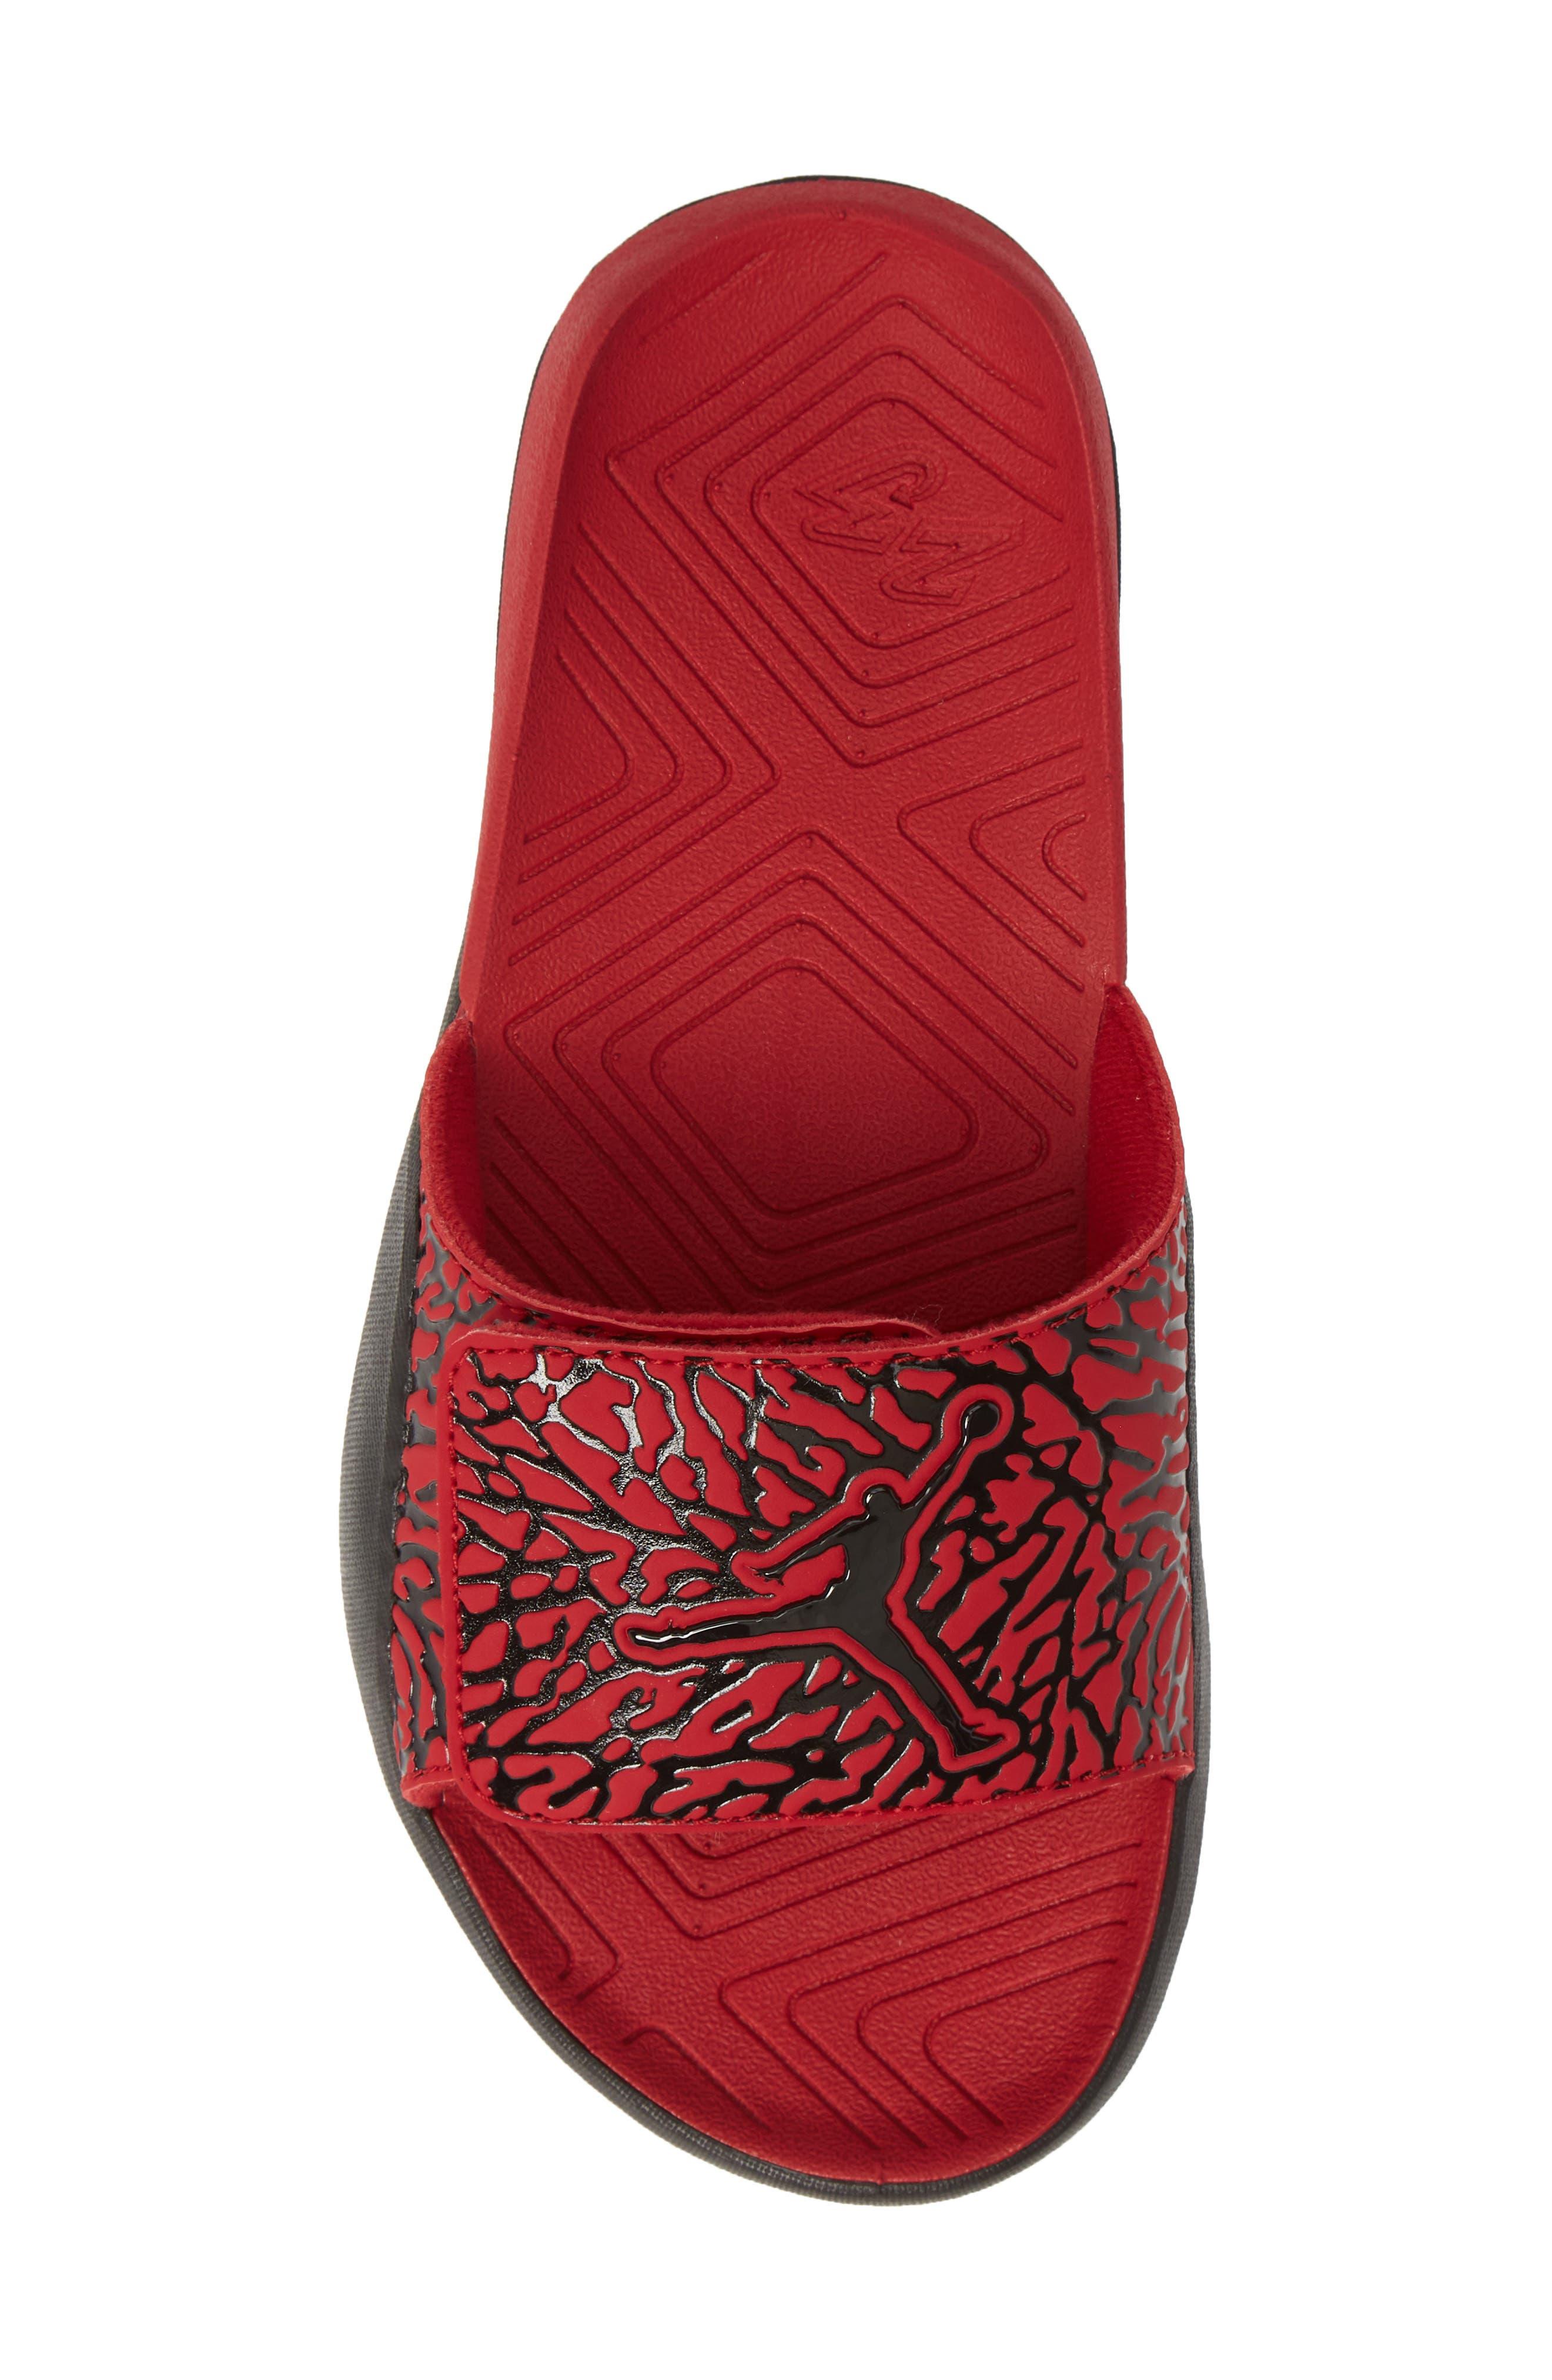 JORDAN, Hydro 7 V2 Sandal, Alternate thumbnail 5, color, GYM RED/ BLACK